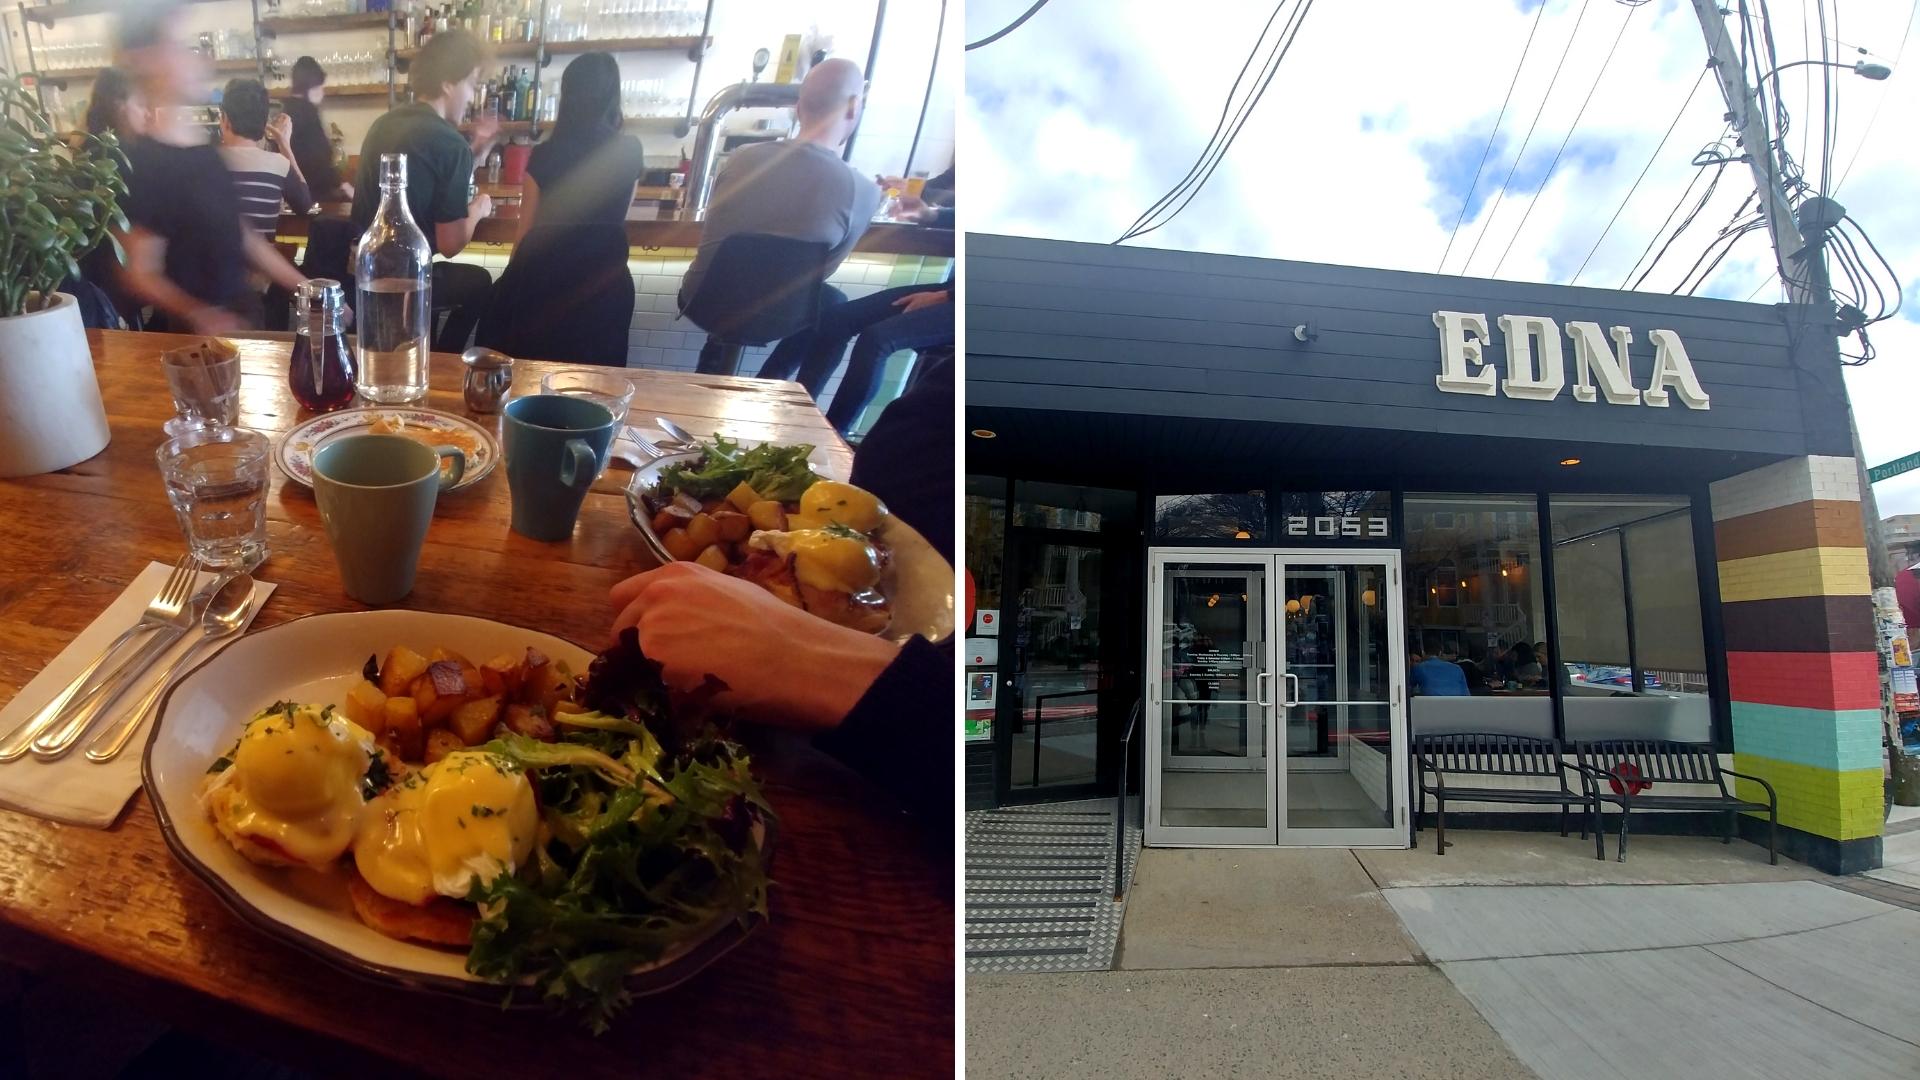 halifax ou manger edna brunch nouvelle-ecosse escapade road-trip blog voyage canada arpenter le chemin